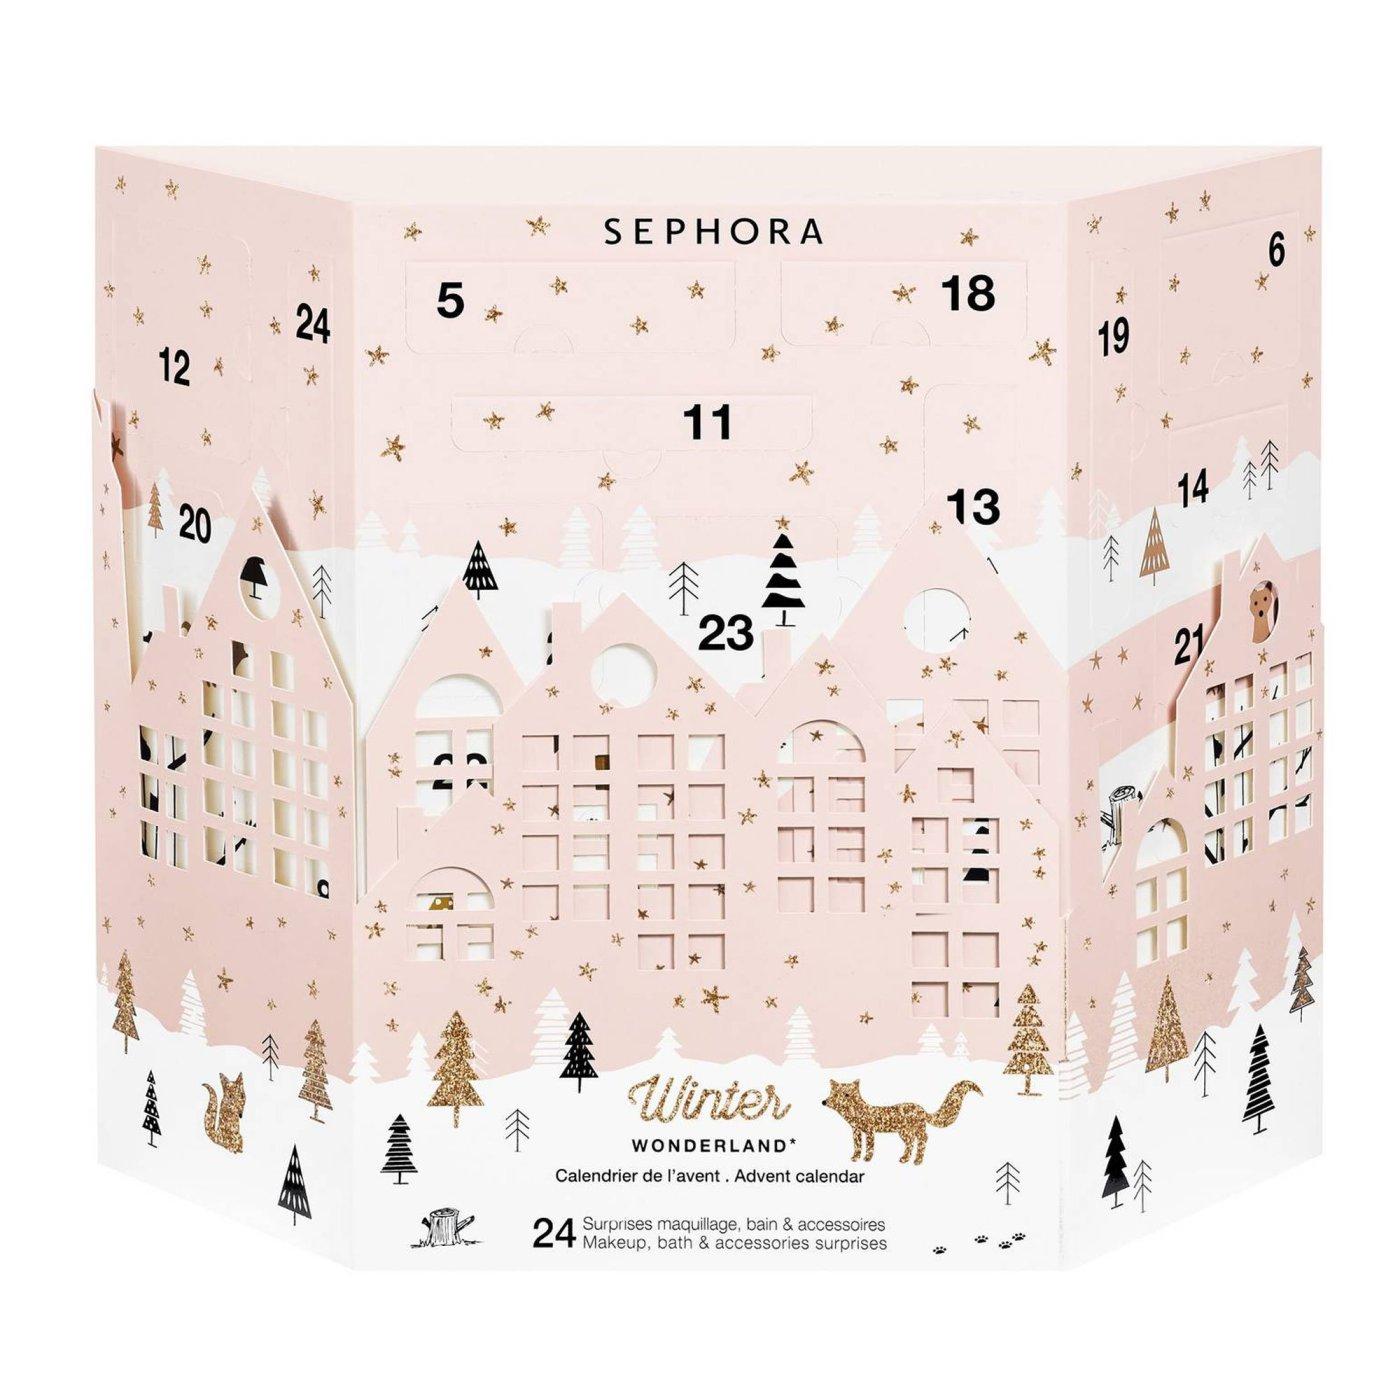 sephora-calendrier.jpg